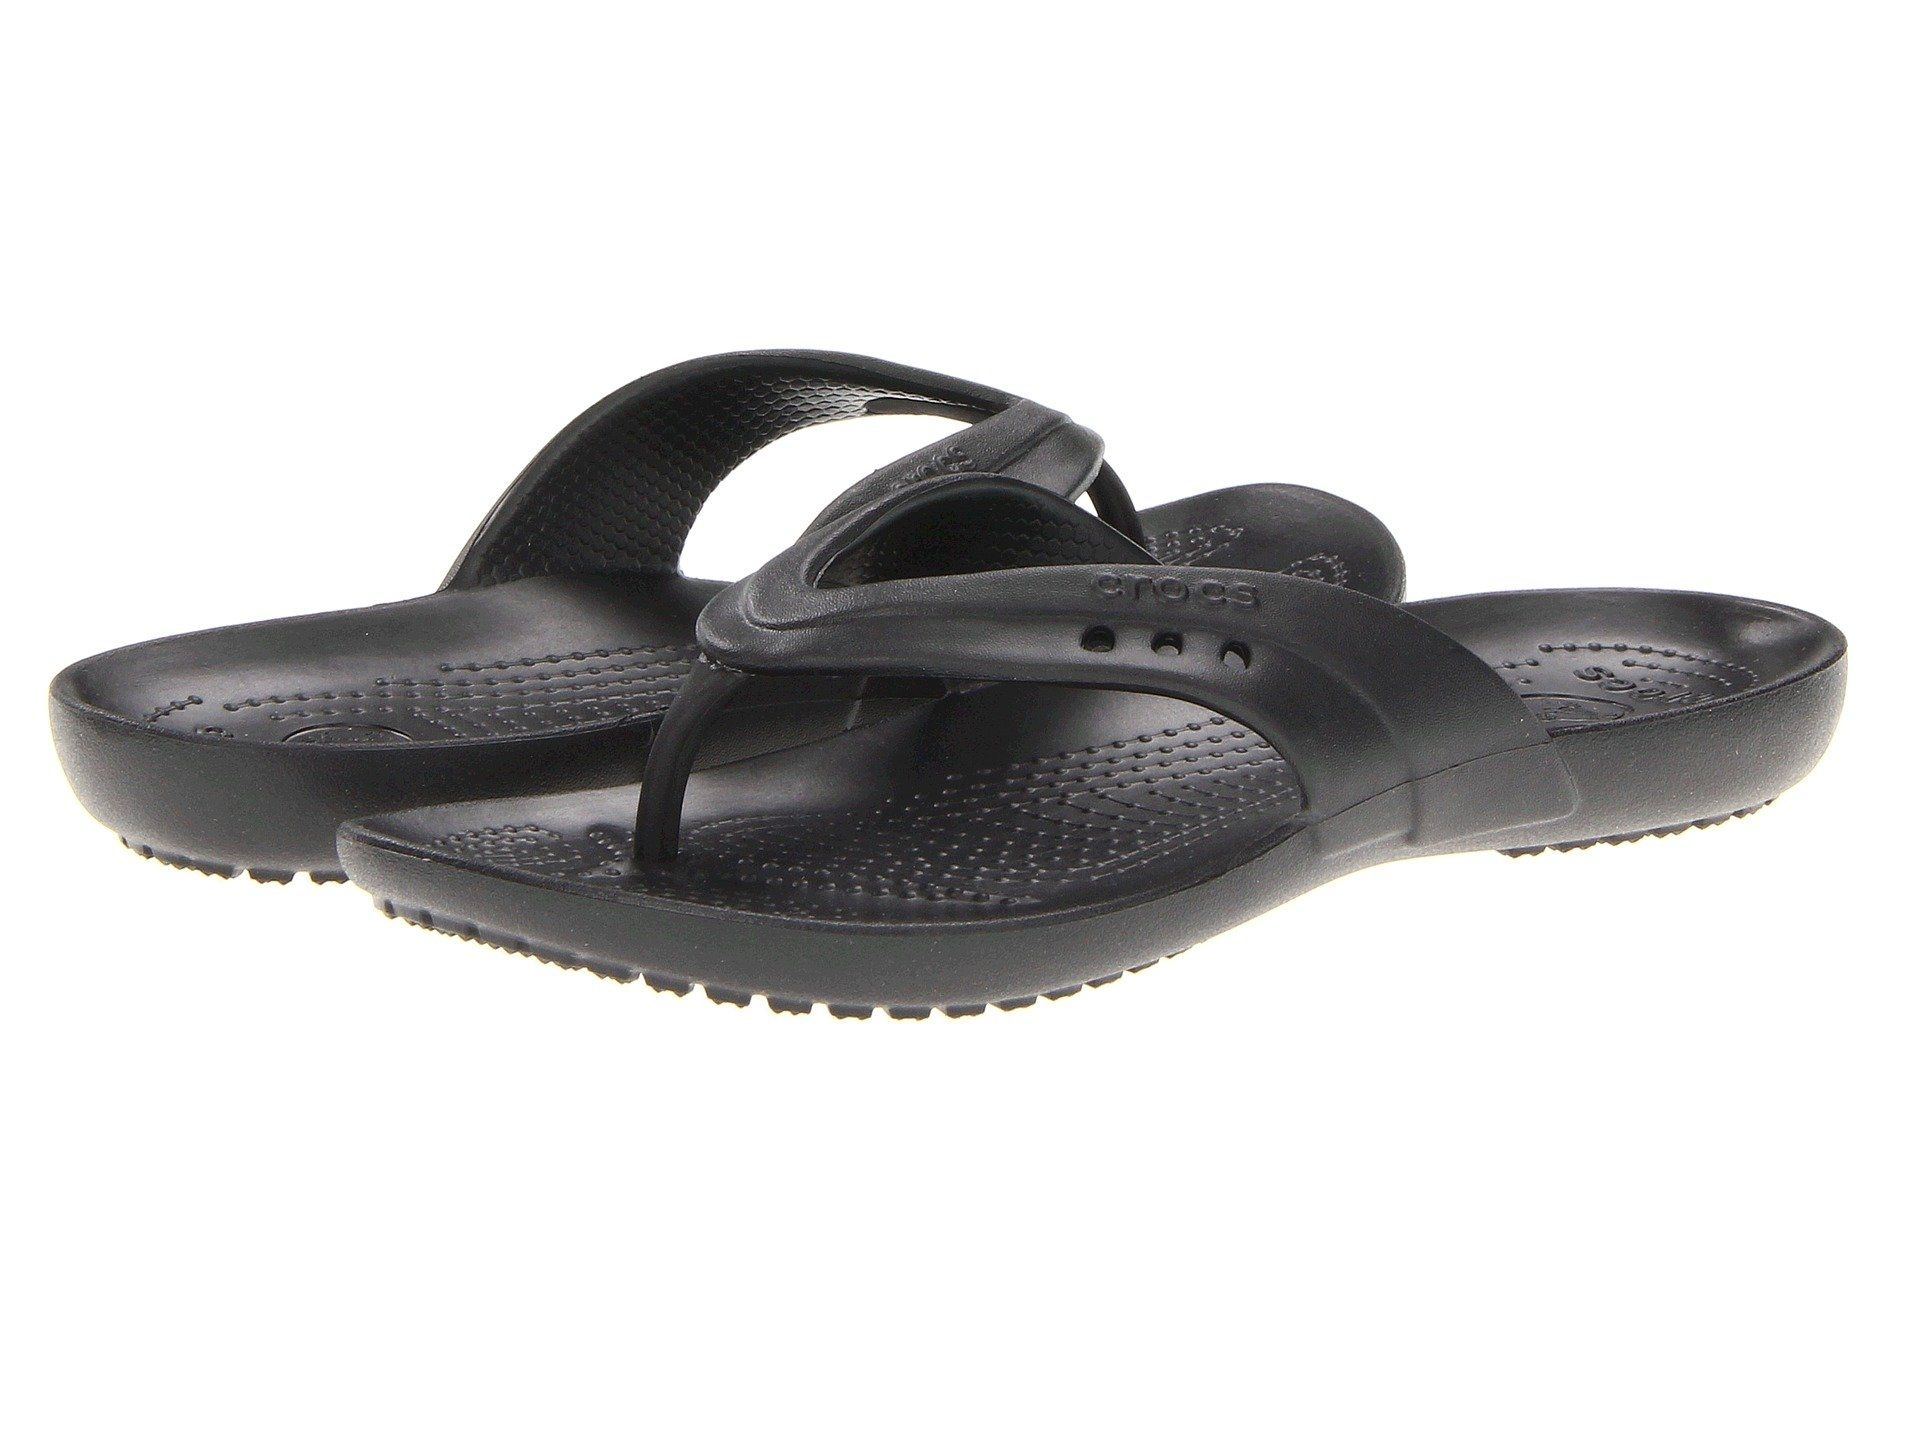 ceb272db33ffcb Crocs Kadee Flip-Flop